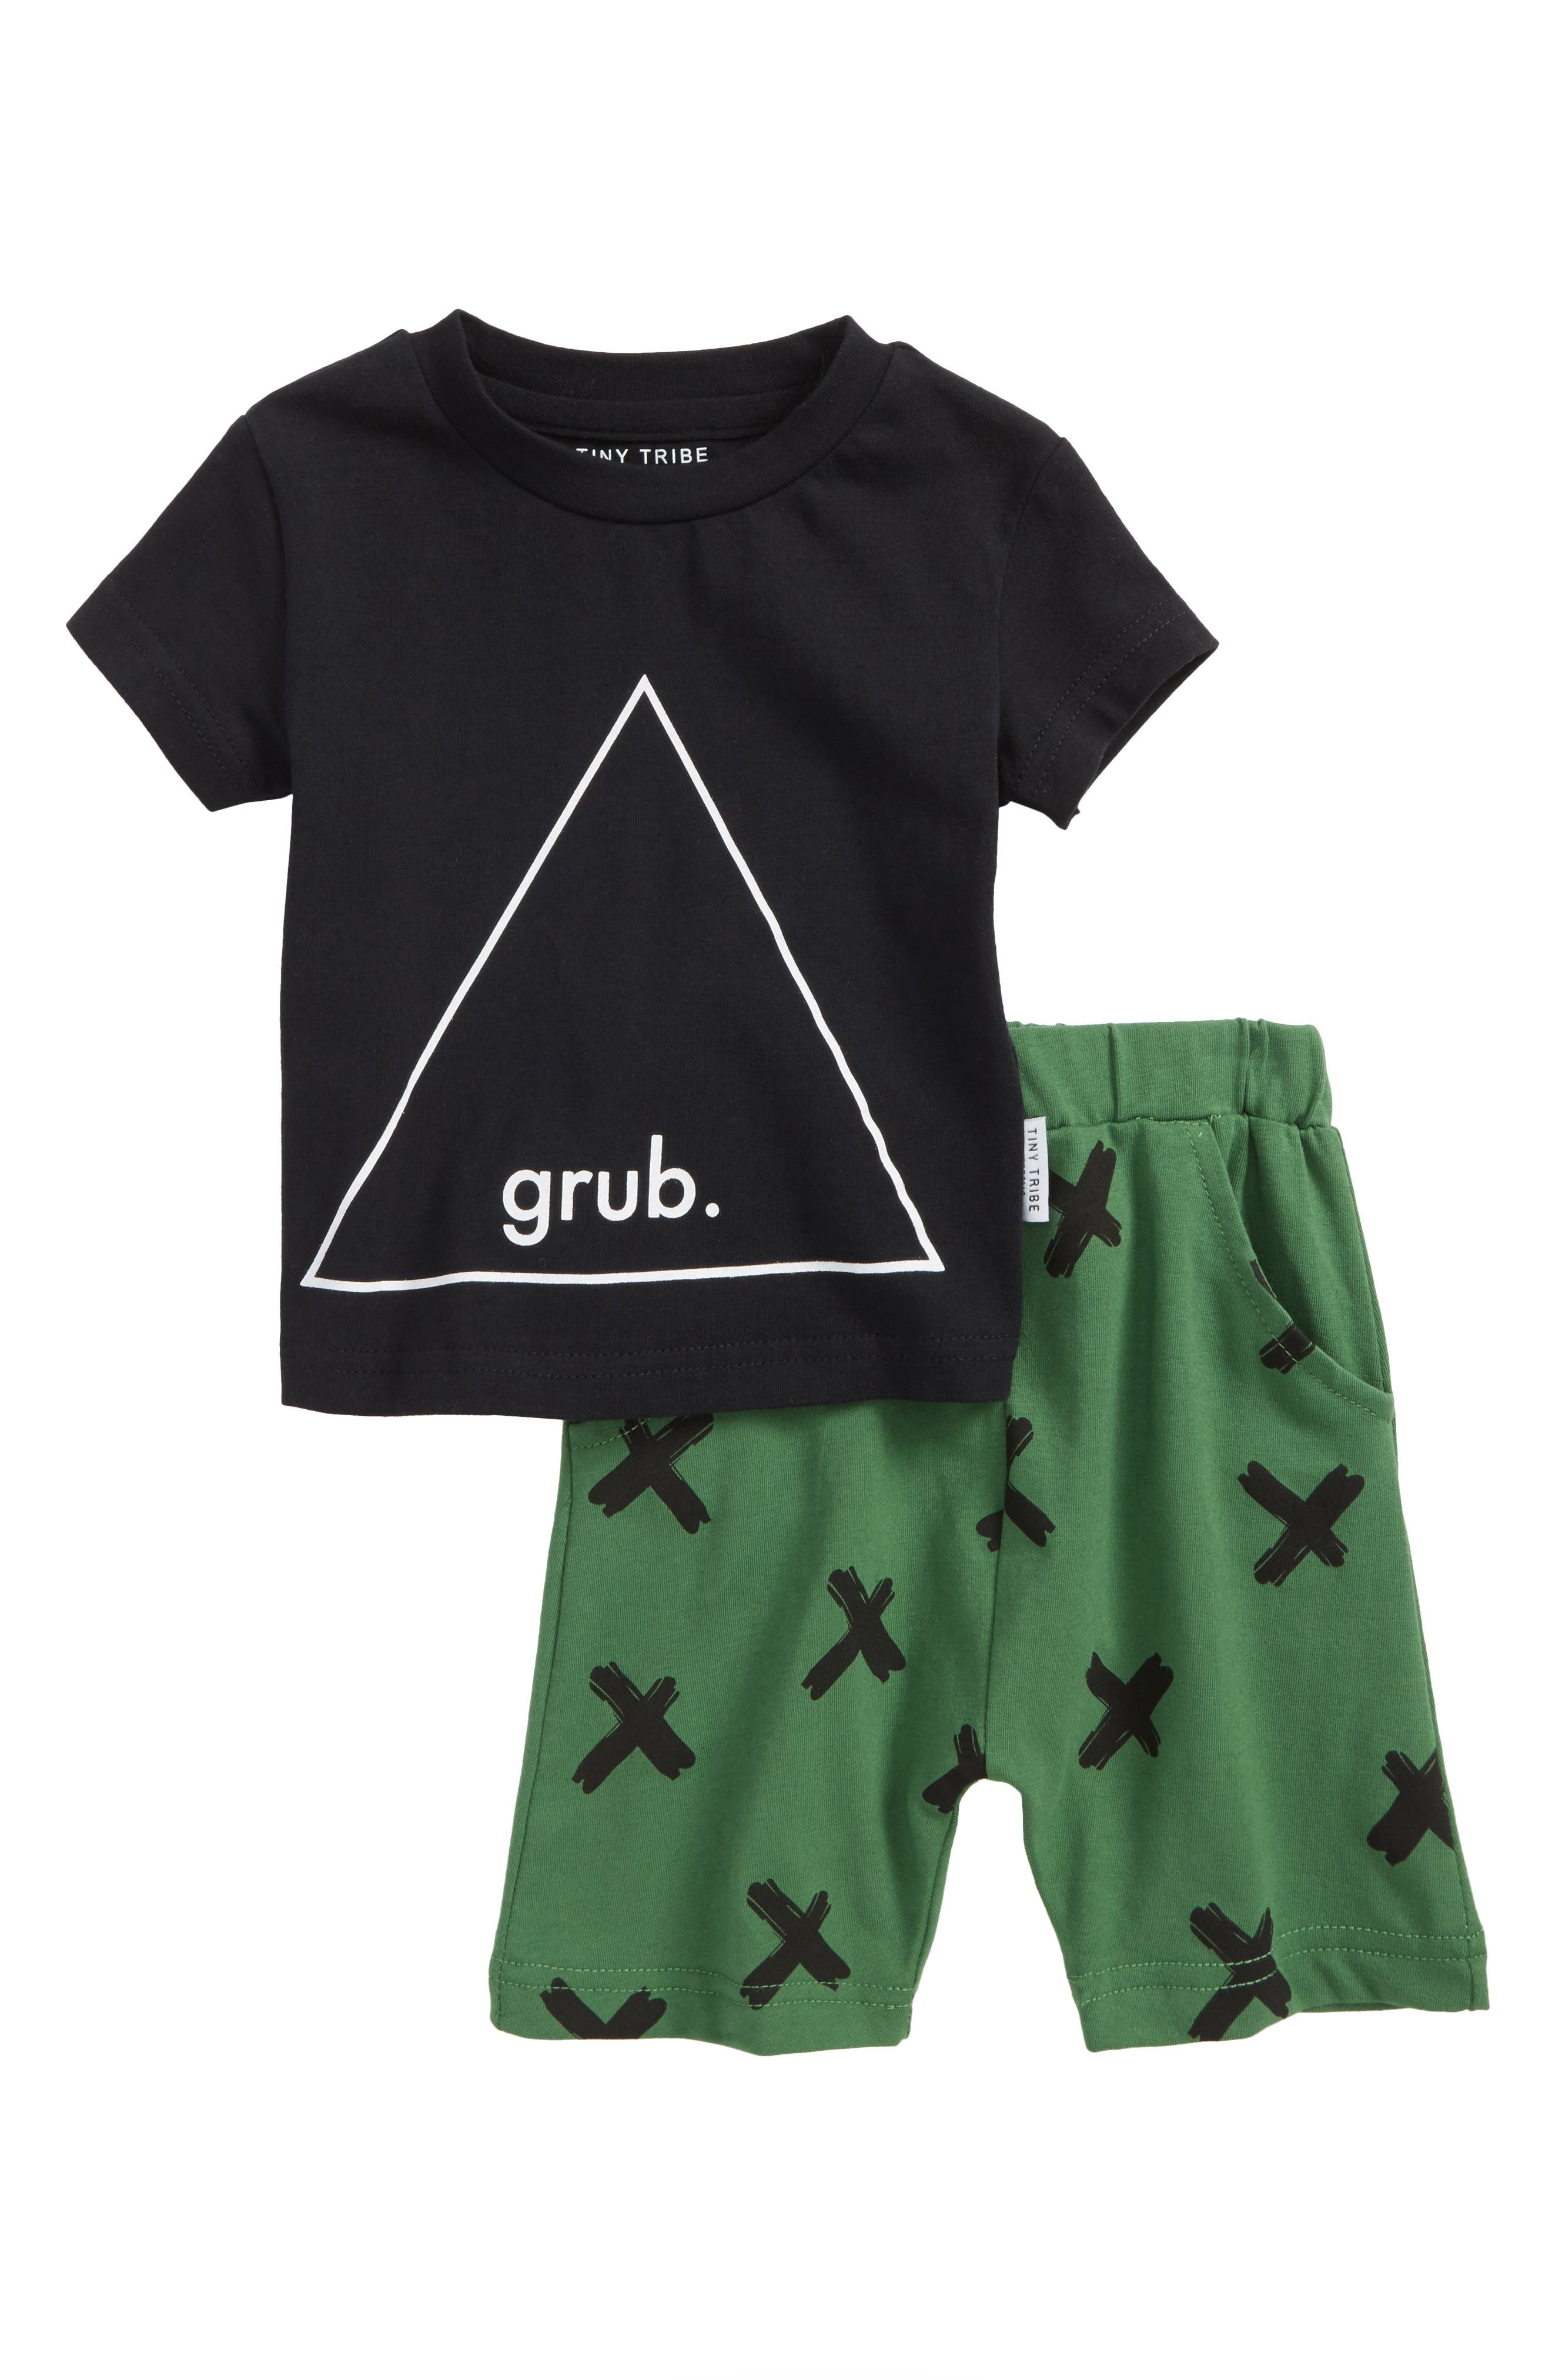 Alternate Image 1 Selected - Tiny Tribe Grub T-Shirt & Shorts Set (Baby Boys)